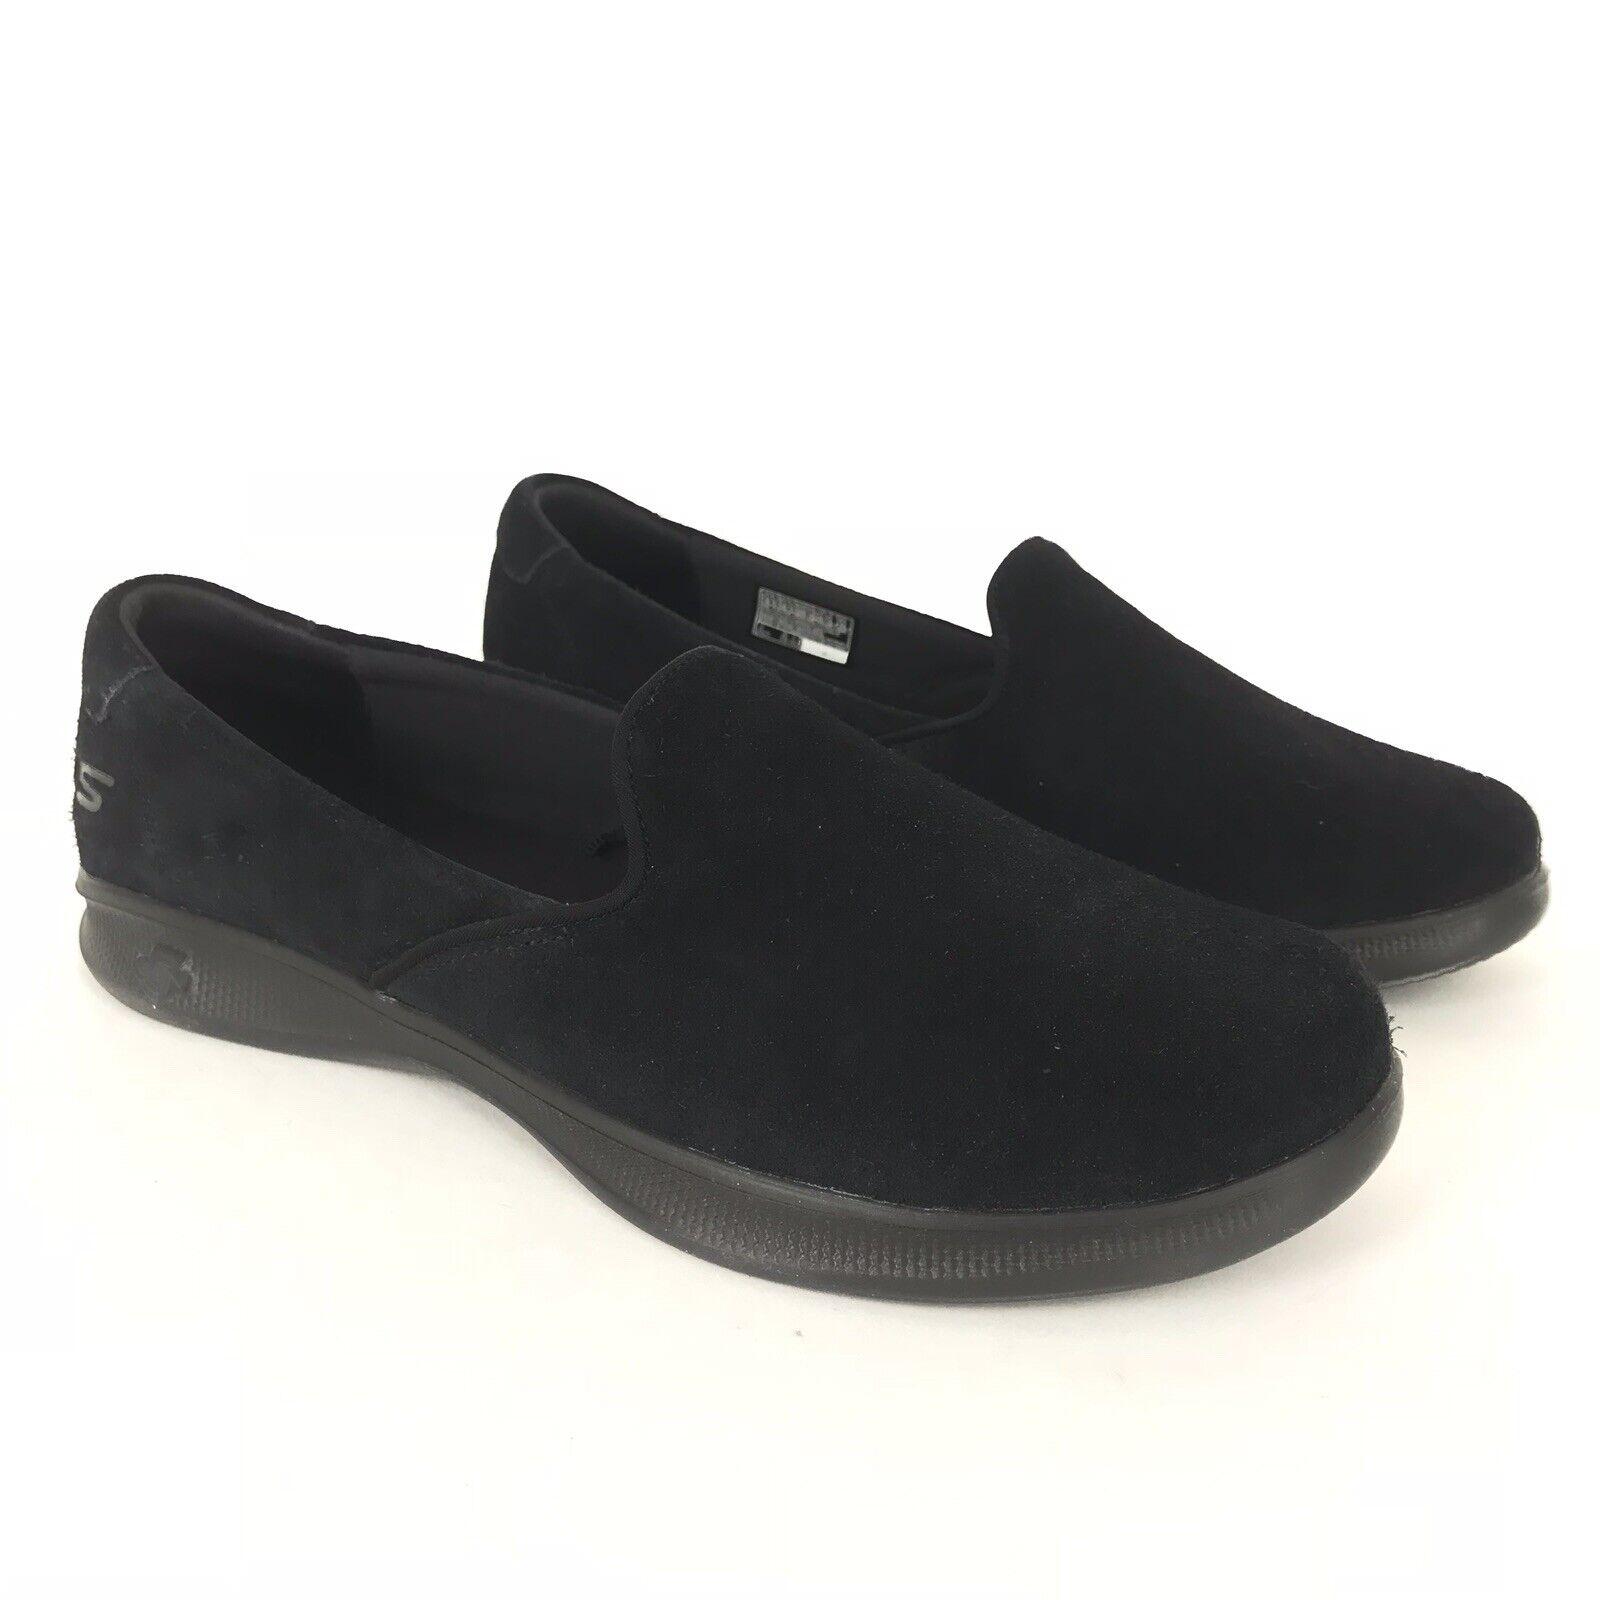 Skechers  9.5 M Black Delight GOstep Lite Suede Slip On shoes